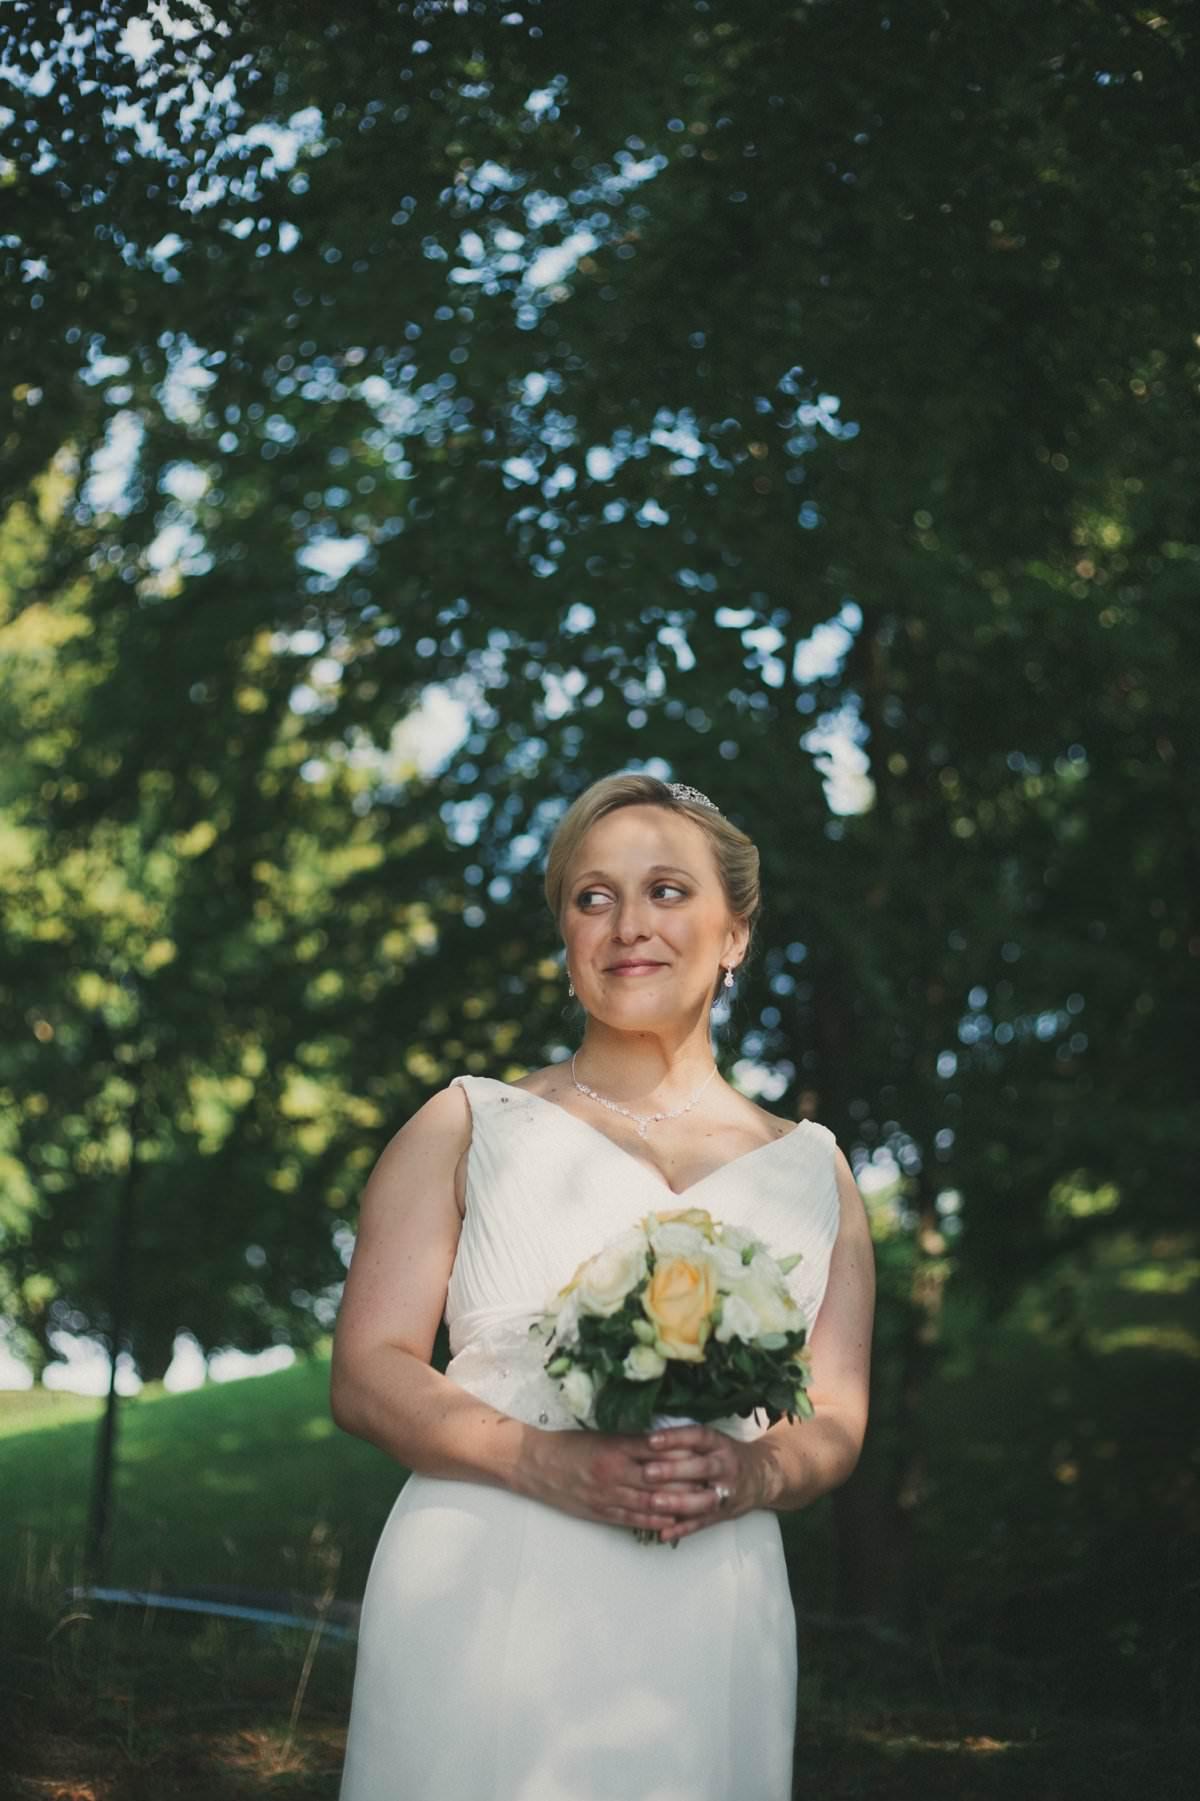 fine-art-destination-wedding-photography-bonn-germany-079